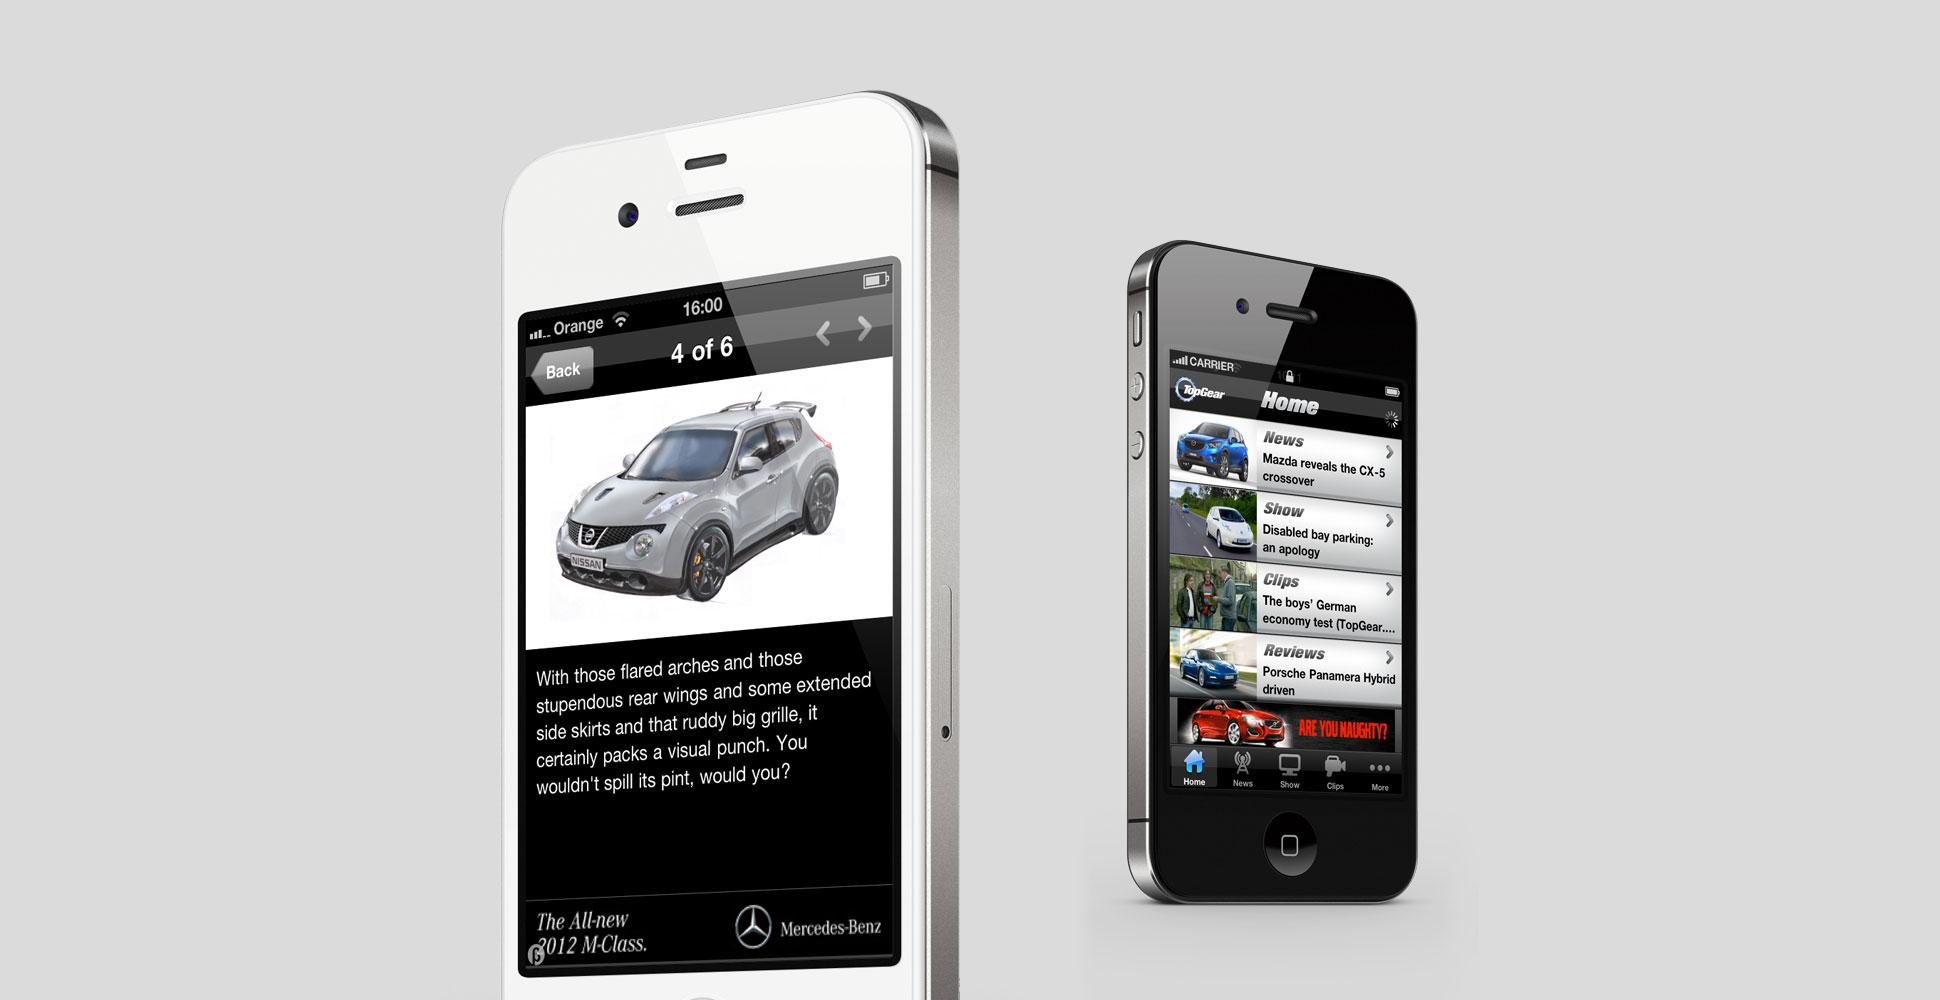 Top Gear Mobile App Images